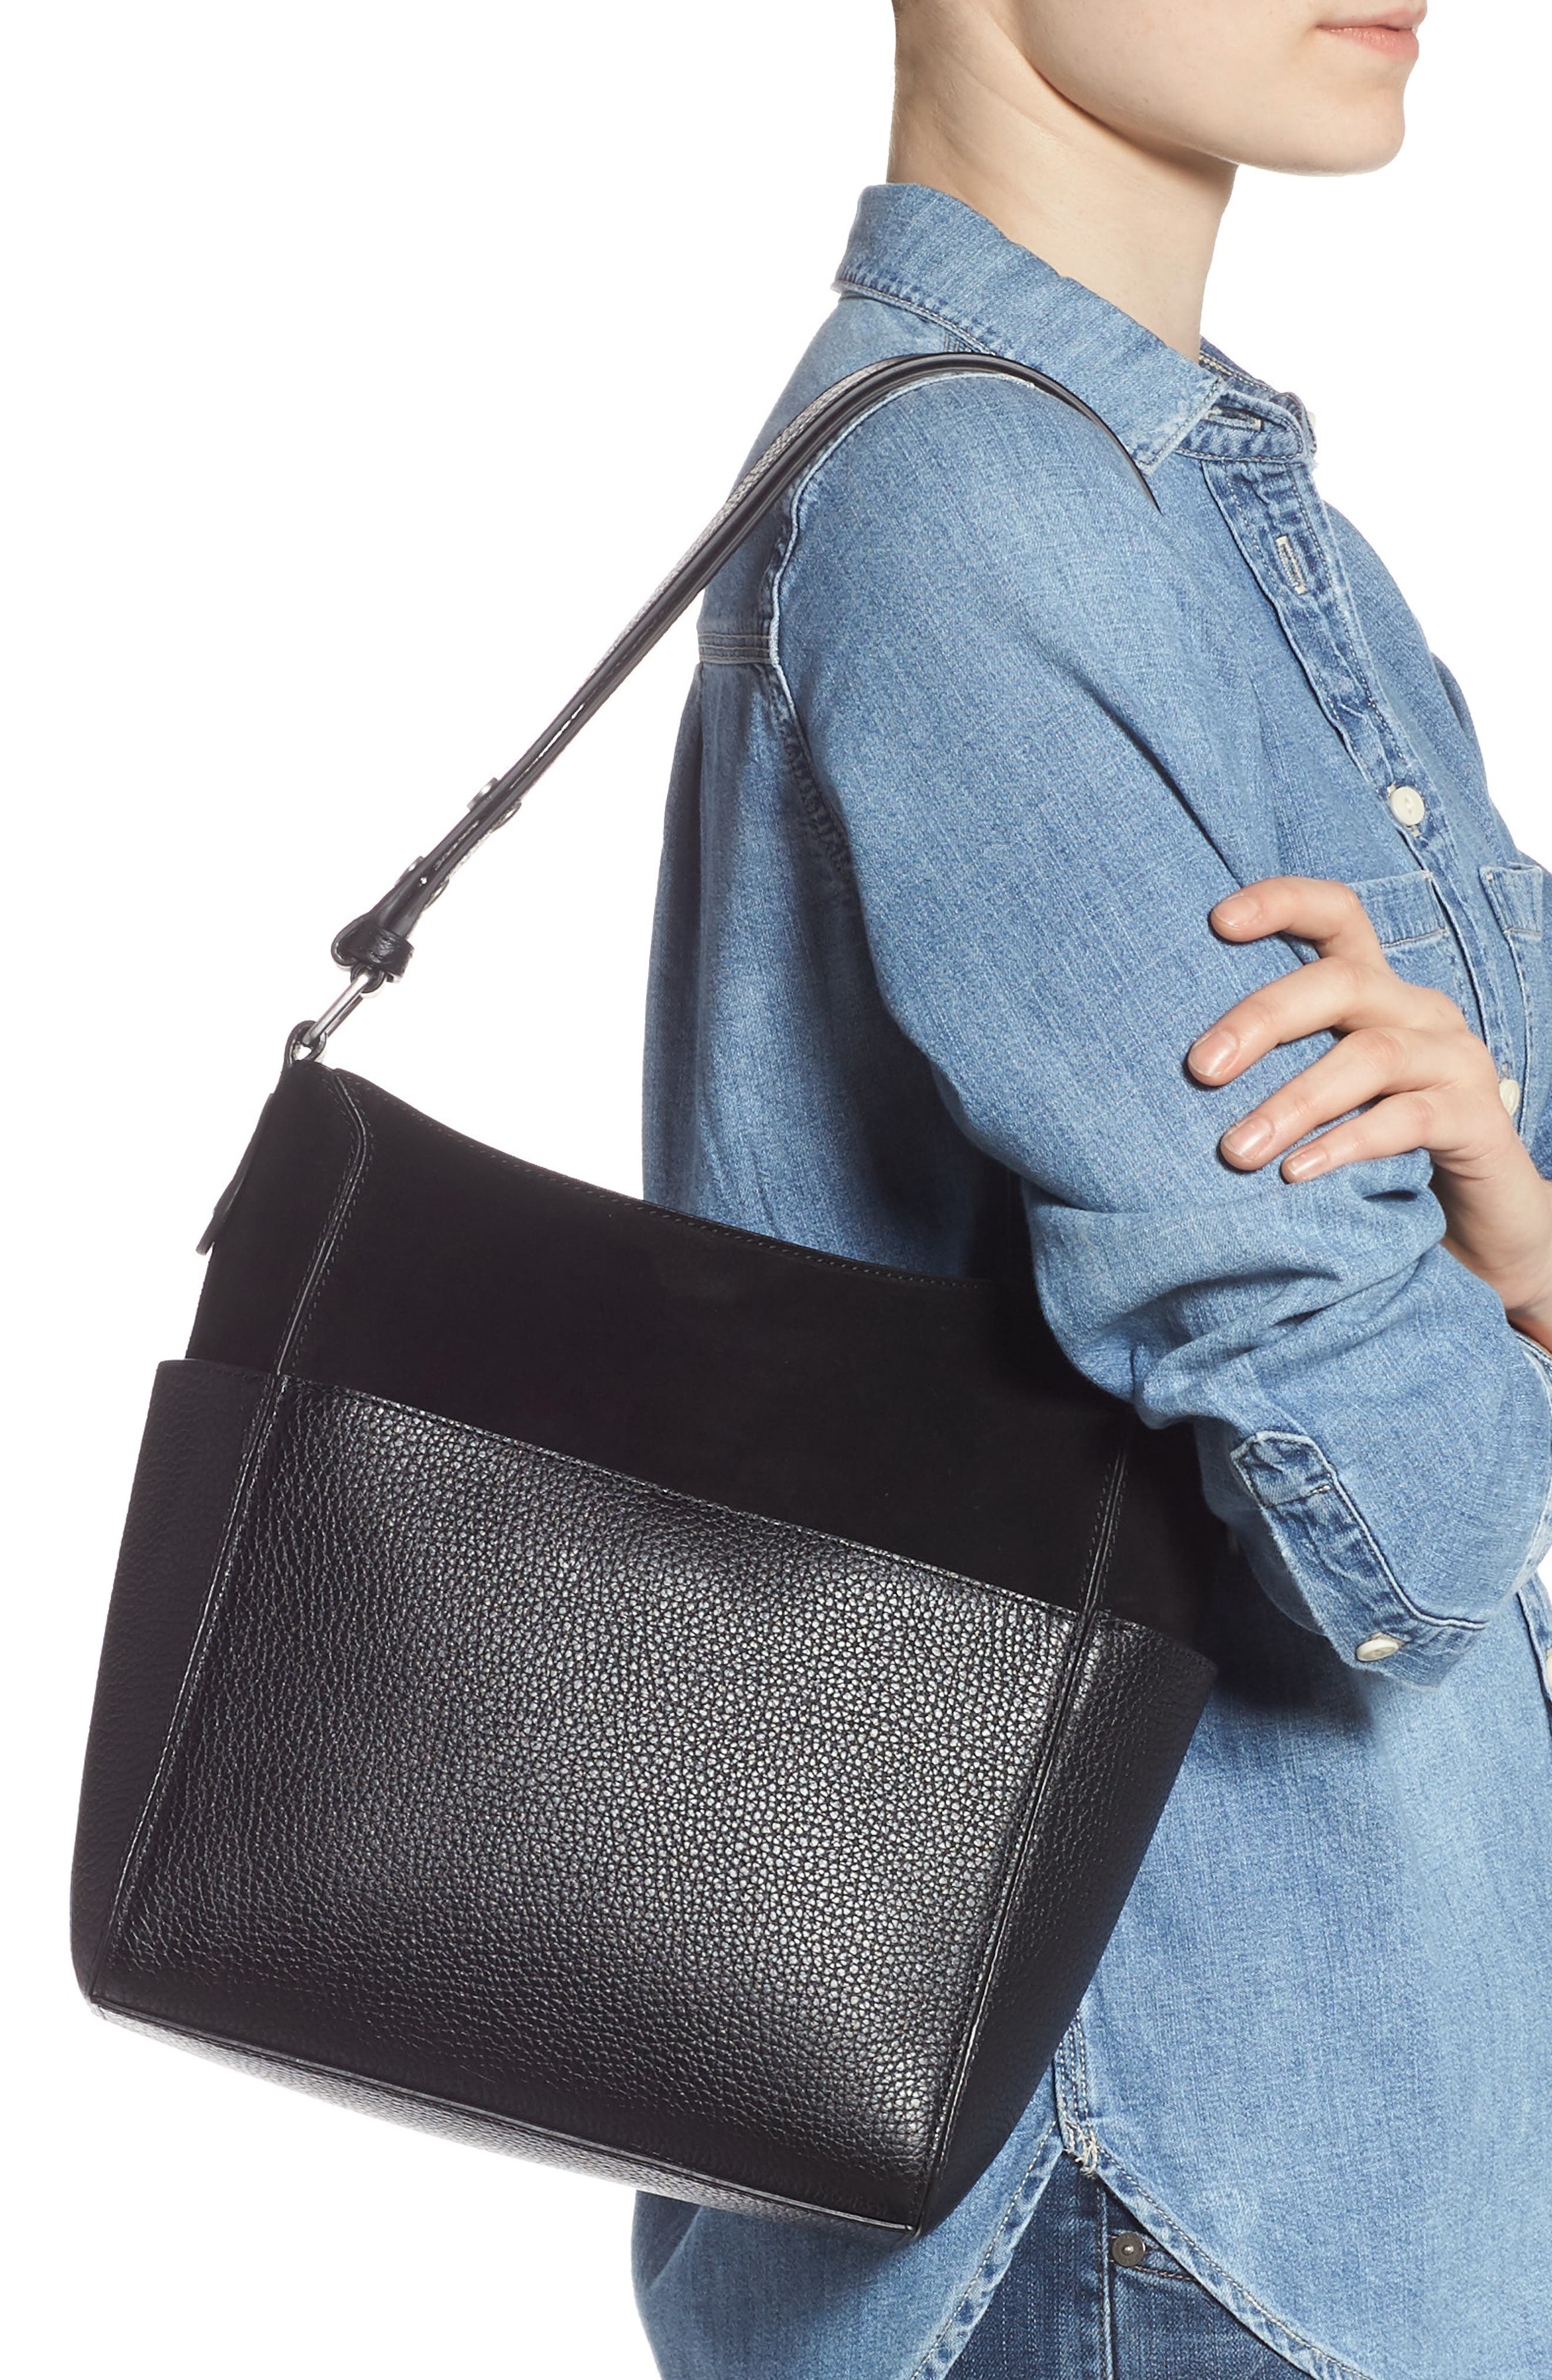 TREASURE & BOND,                             Campbell Leather & Suede Bucket Bag,                             Alternate thumbnail 2, color,                             BLACK